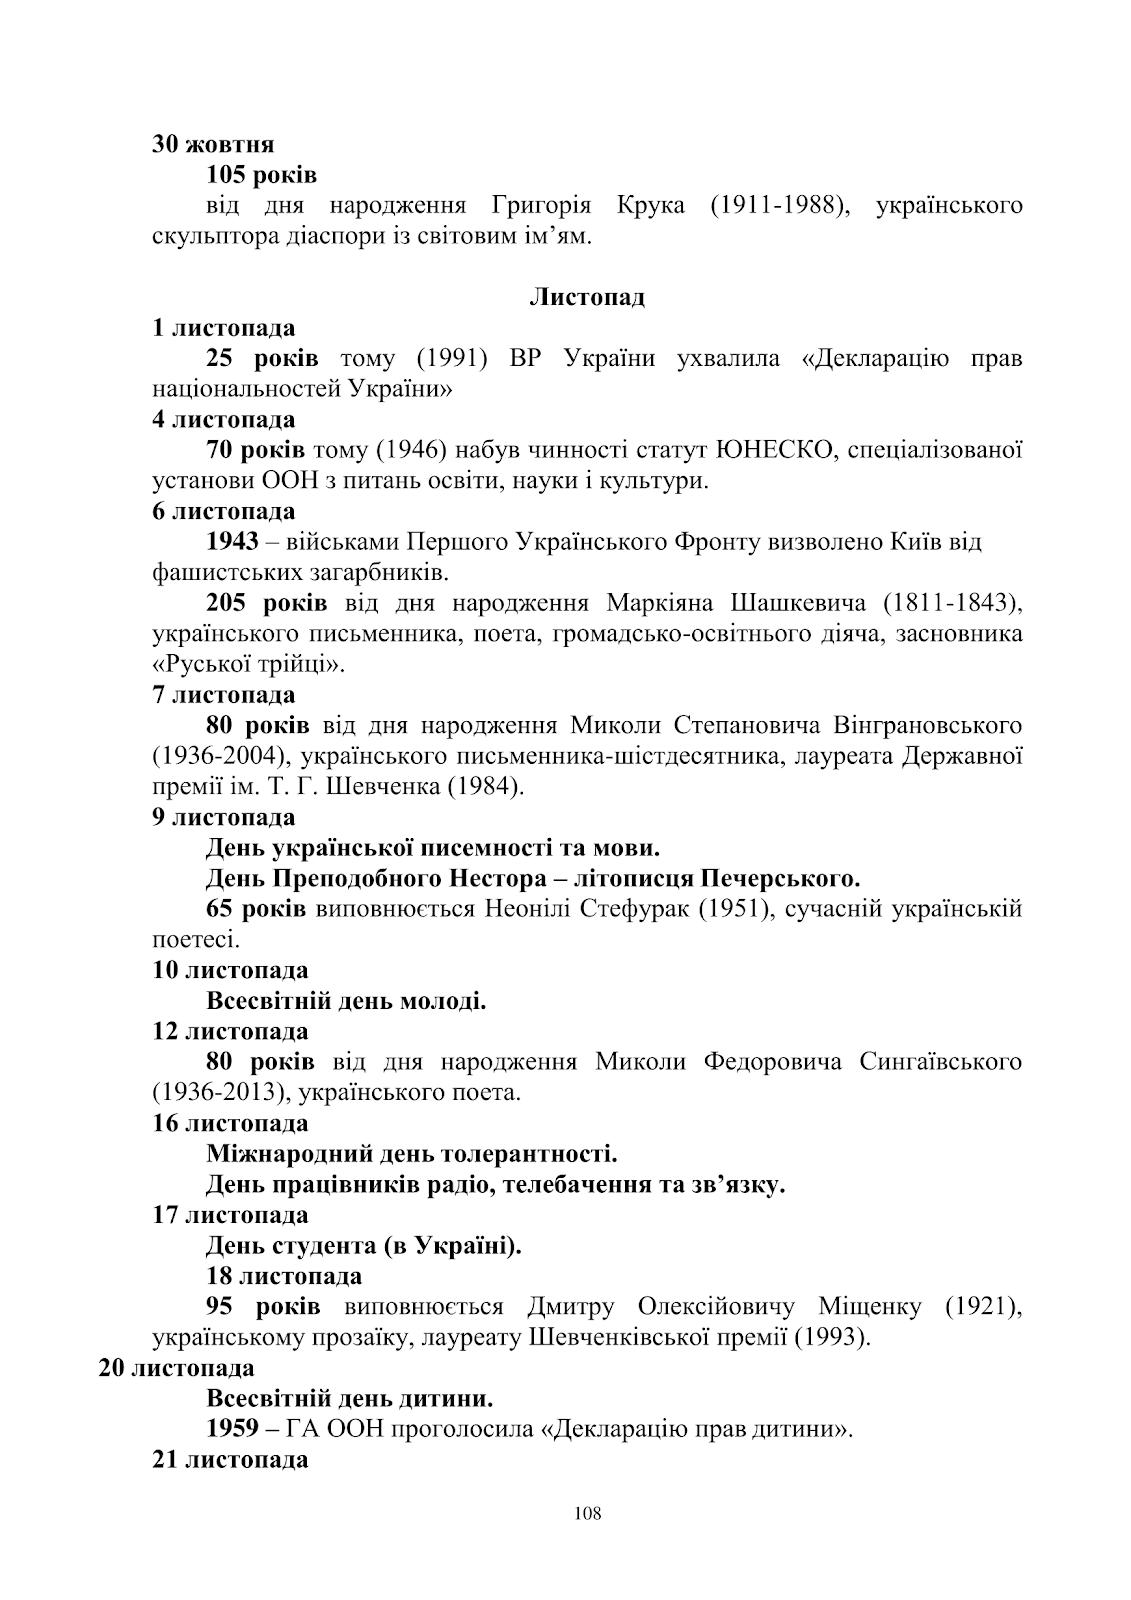 C:\Users\Валерия\Desktop\план 2016 рік\план 2016 рік-108.png